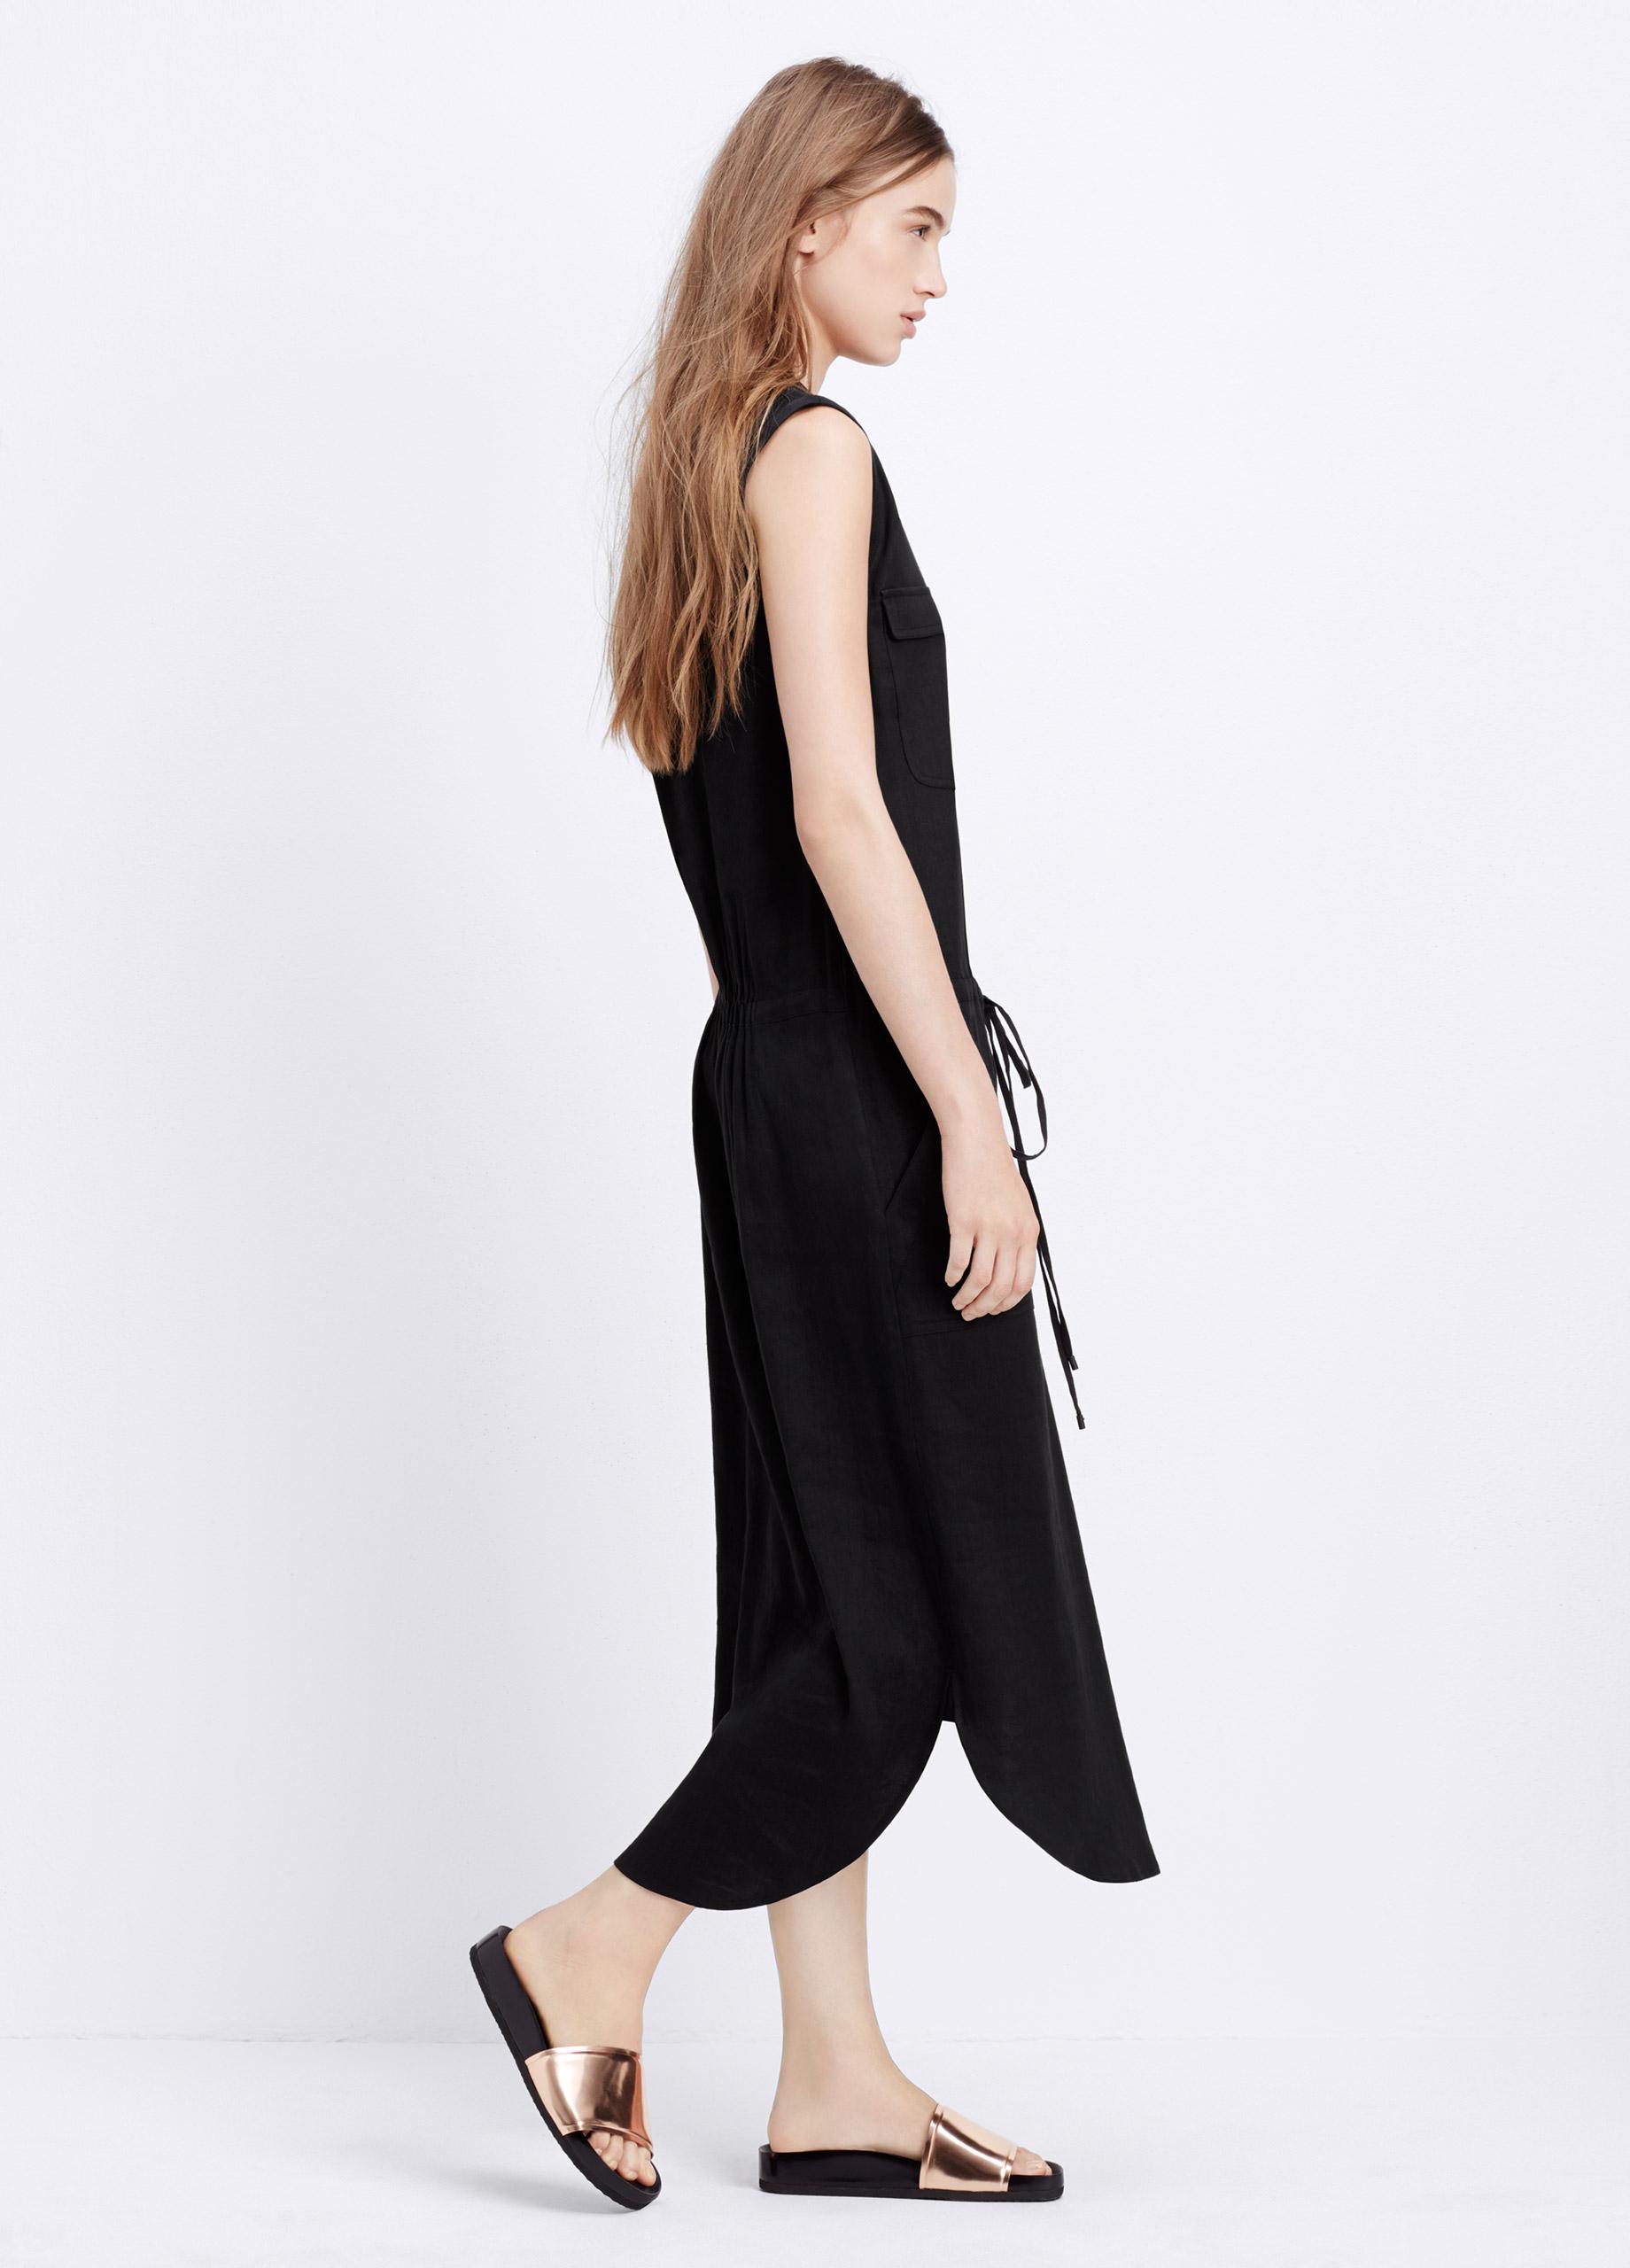 Black drawstring waist dresses